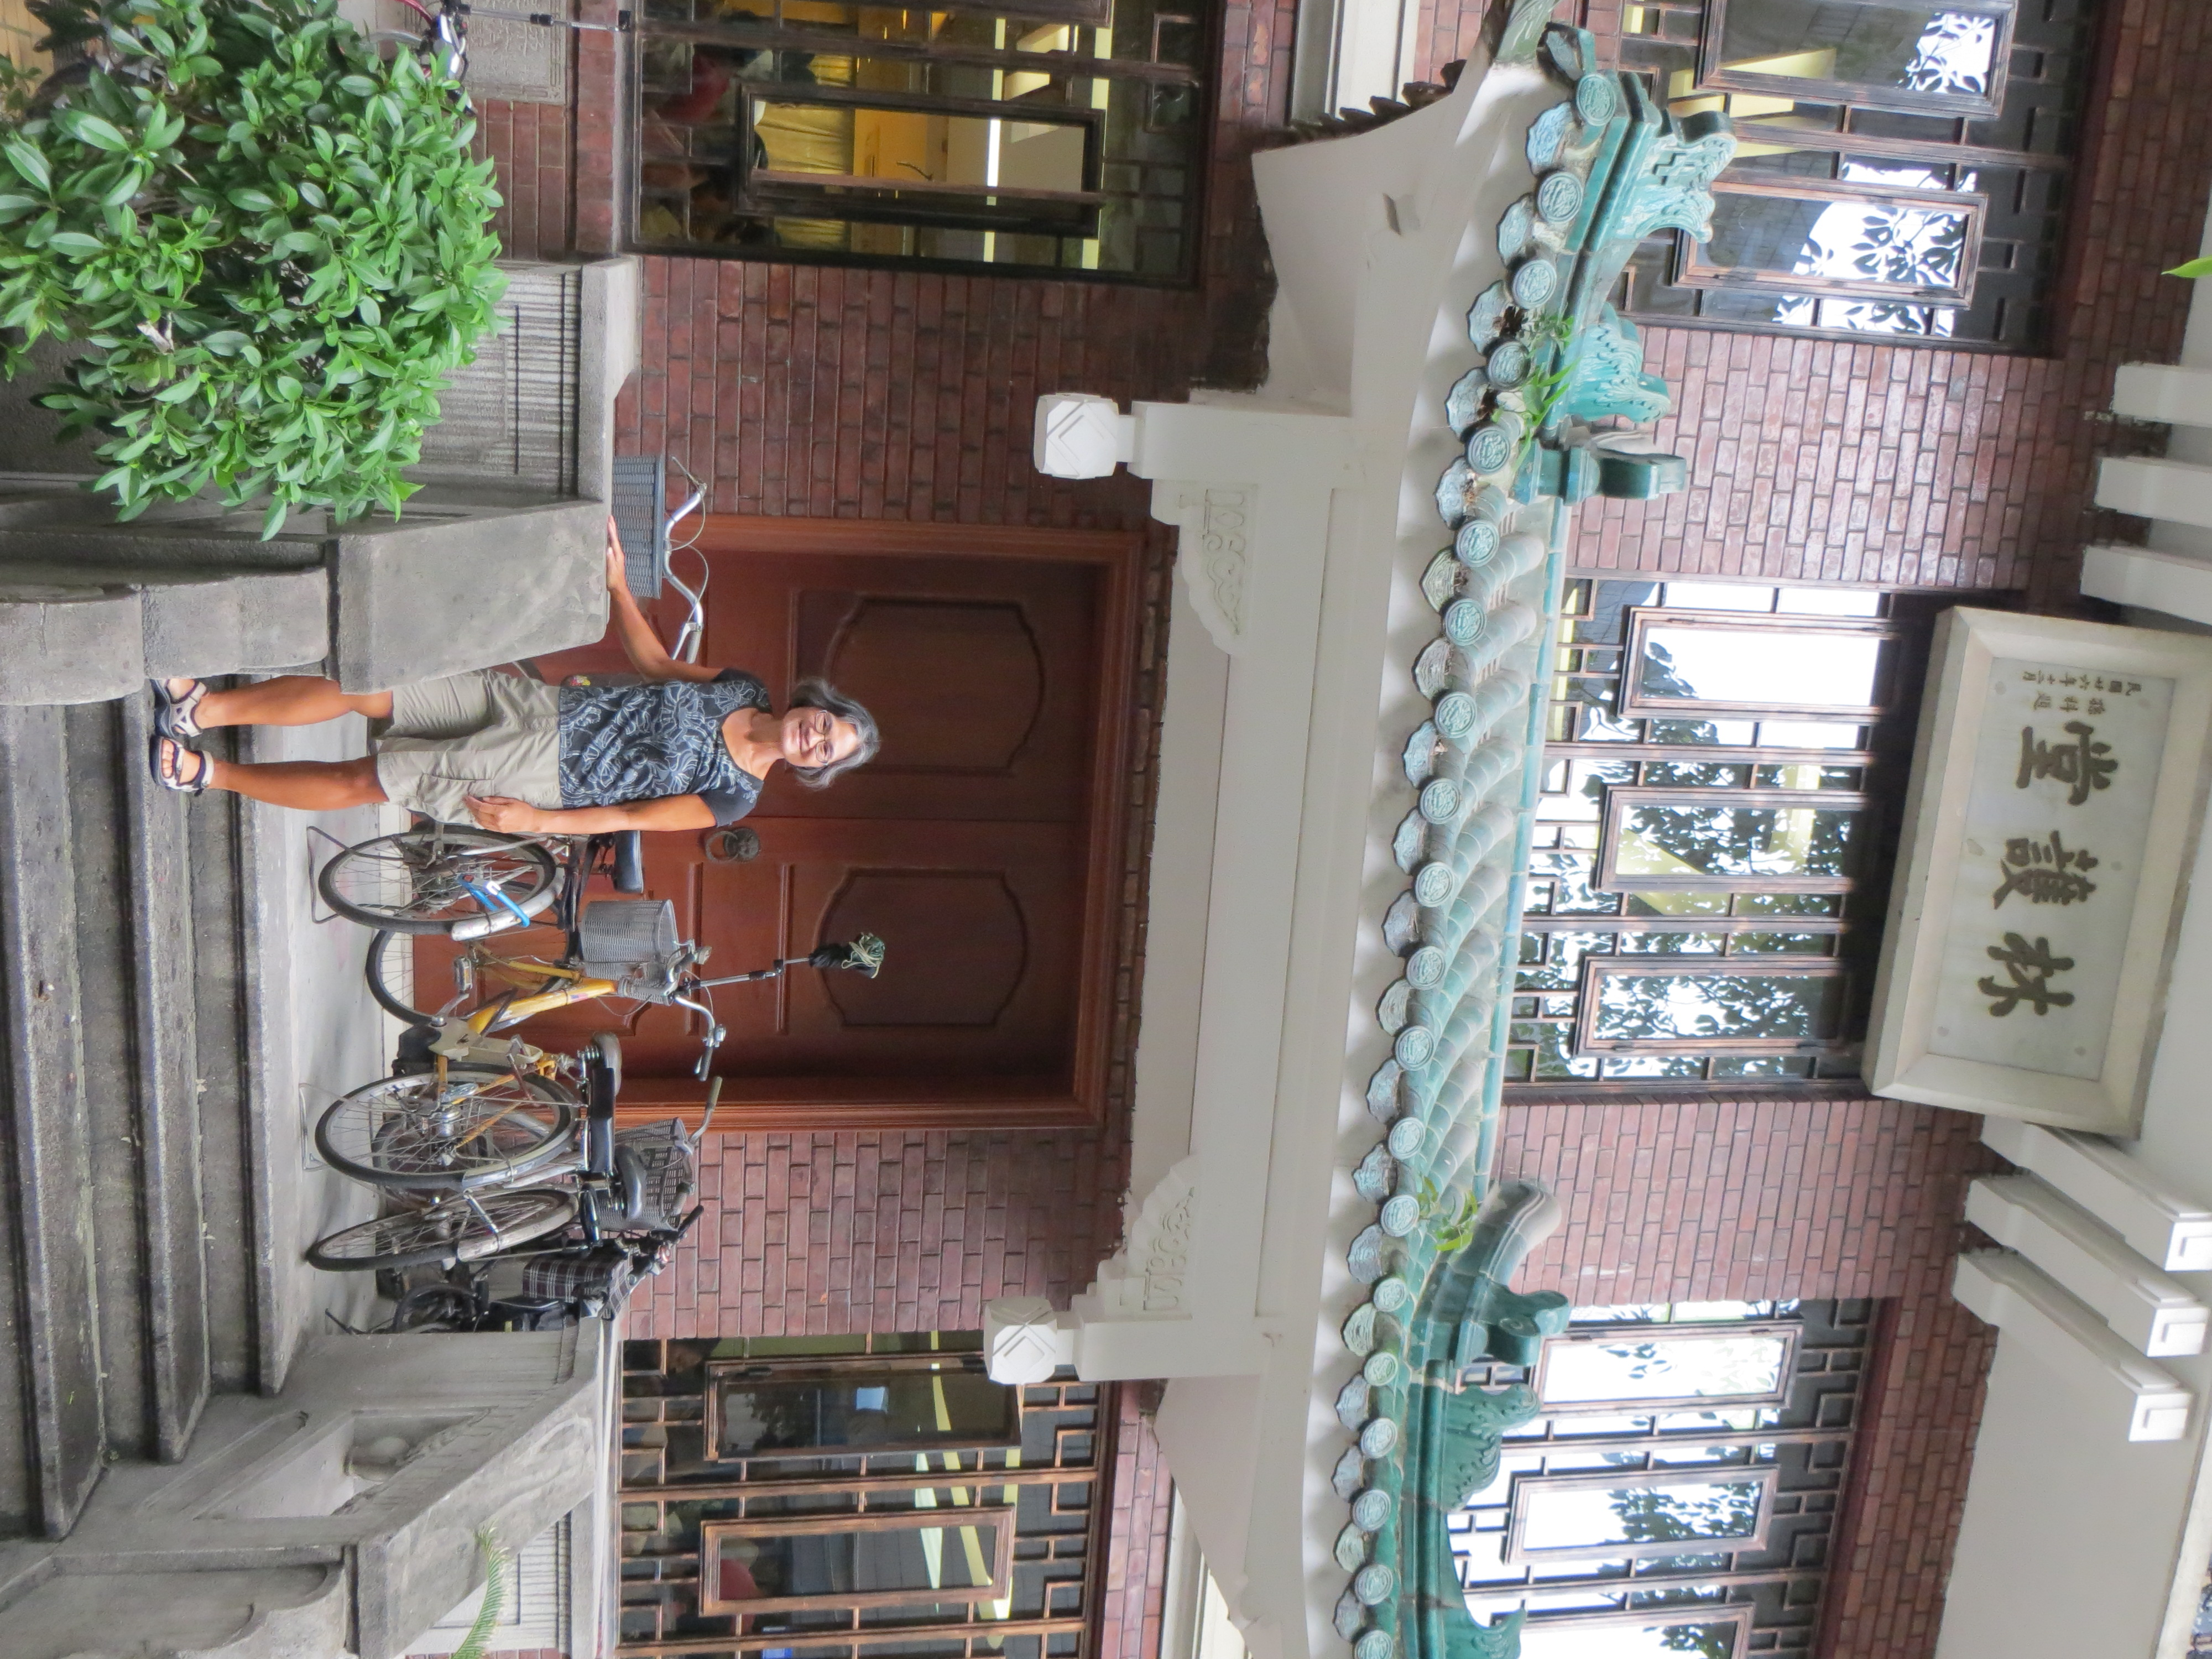 Guangzhou heritage hospital where MM was born original building perhaps 2016-06-27 057